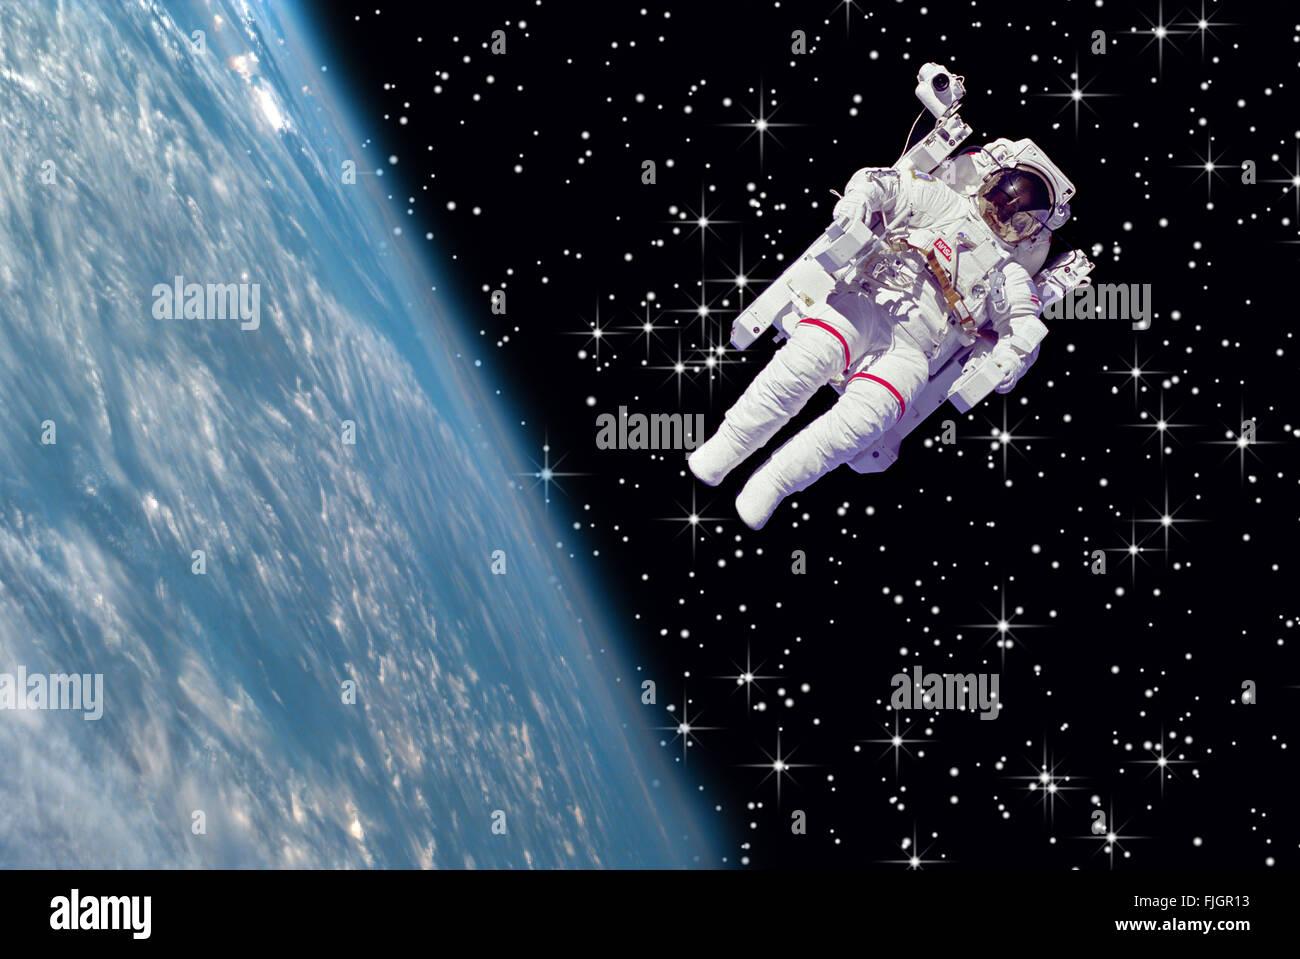 NASA image astronaut earth floating space stars - Stock Image